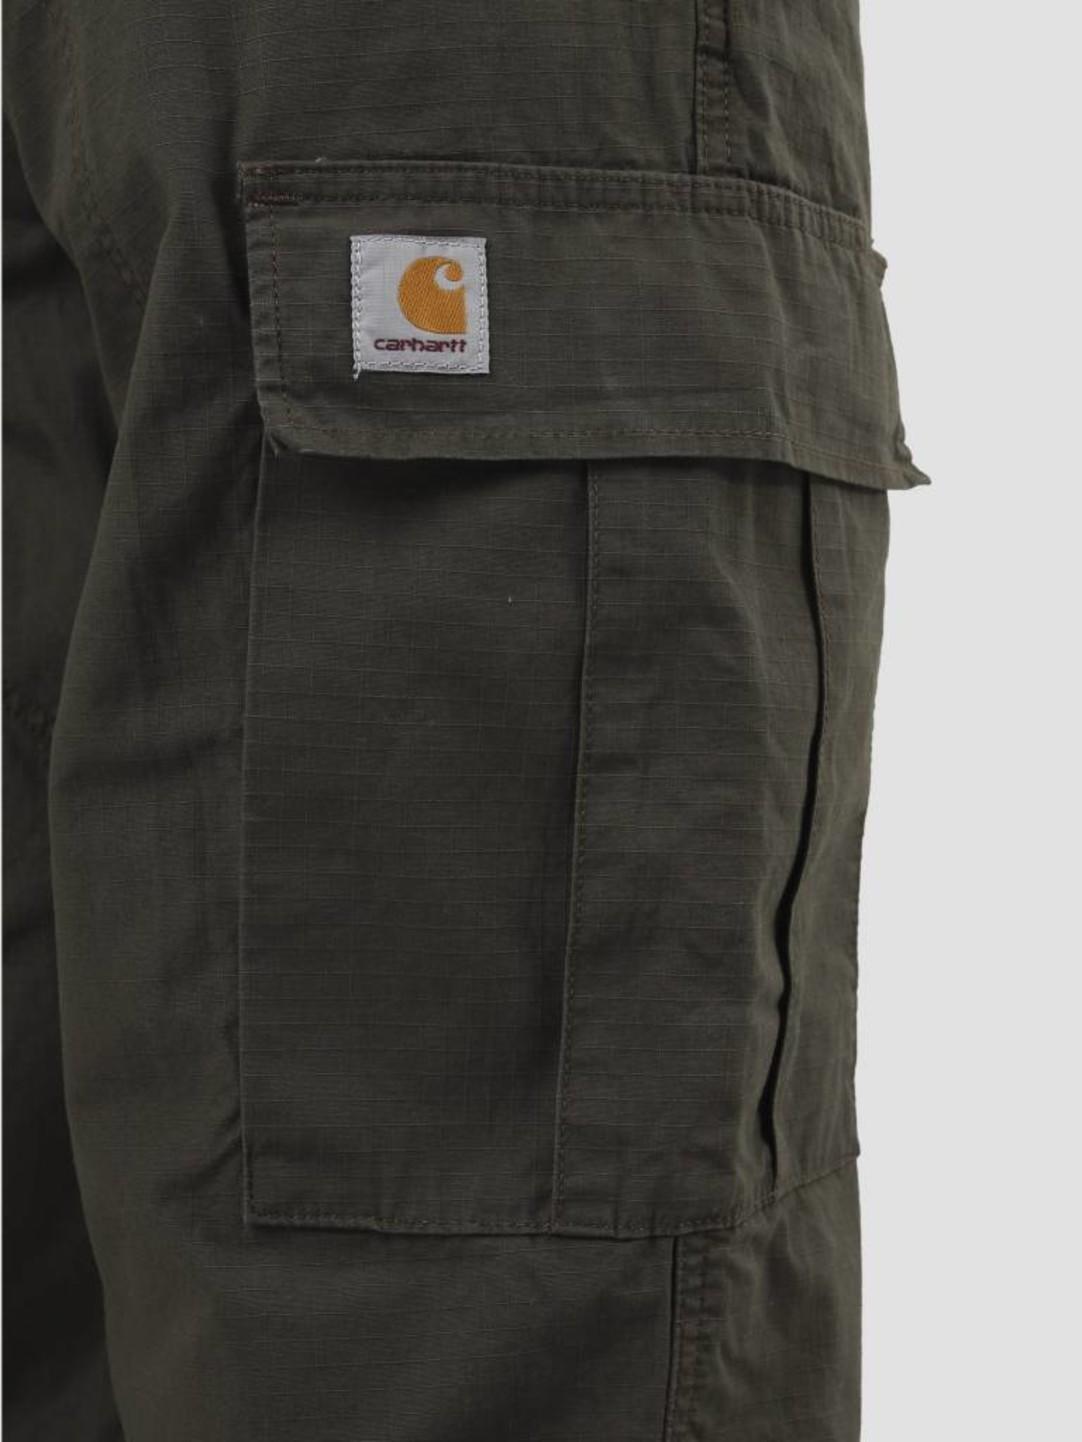 Carhartt WIP Carhartt WIP Cargo Pant Rinsed Cypress I000949-6302